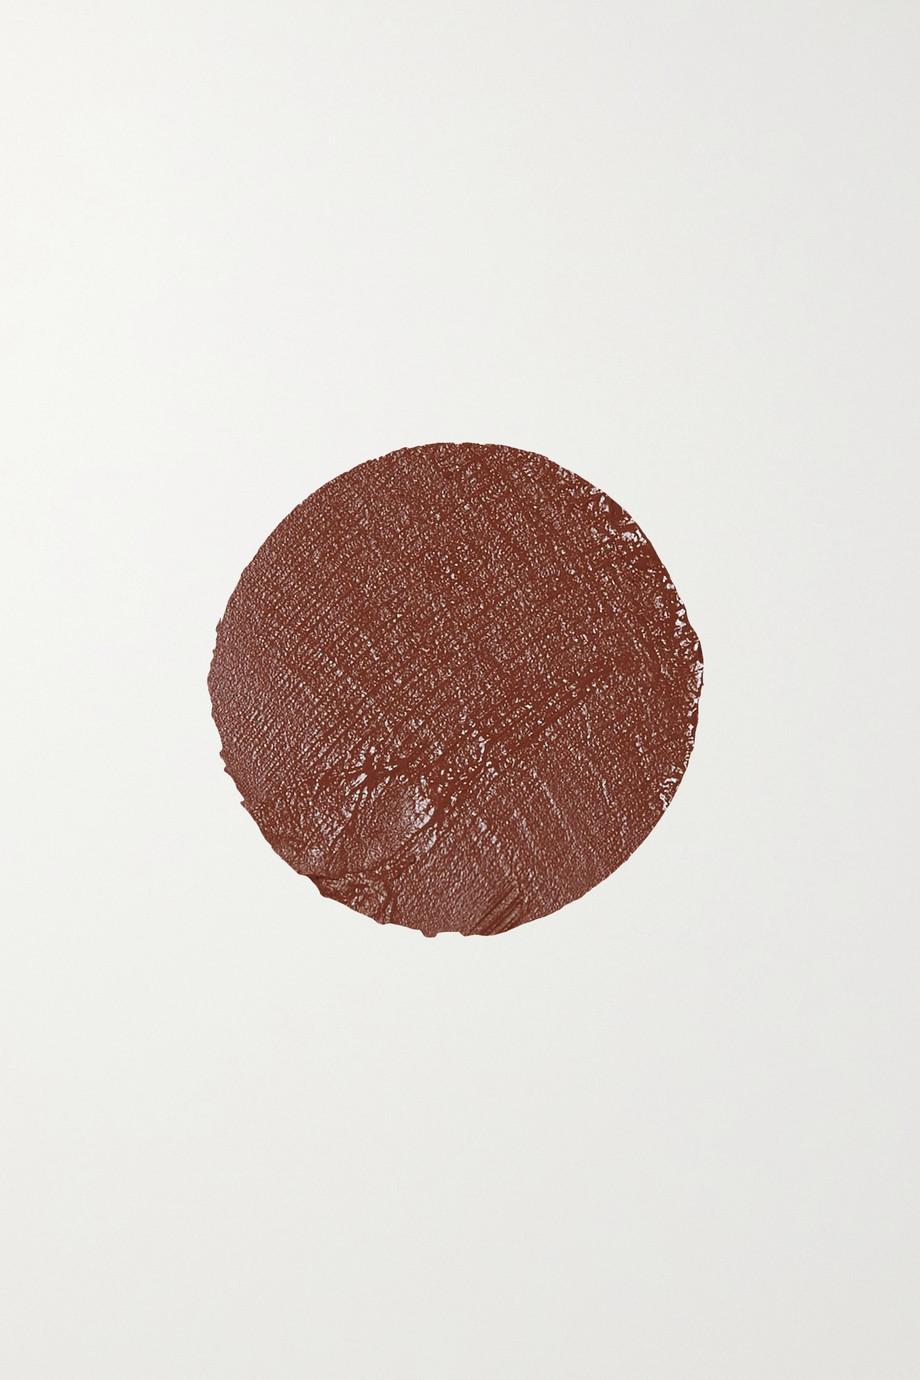 Huda Beauty Power Bullet Cream Glow Lipstick - Boss Chick